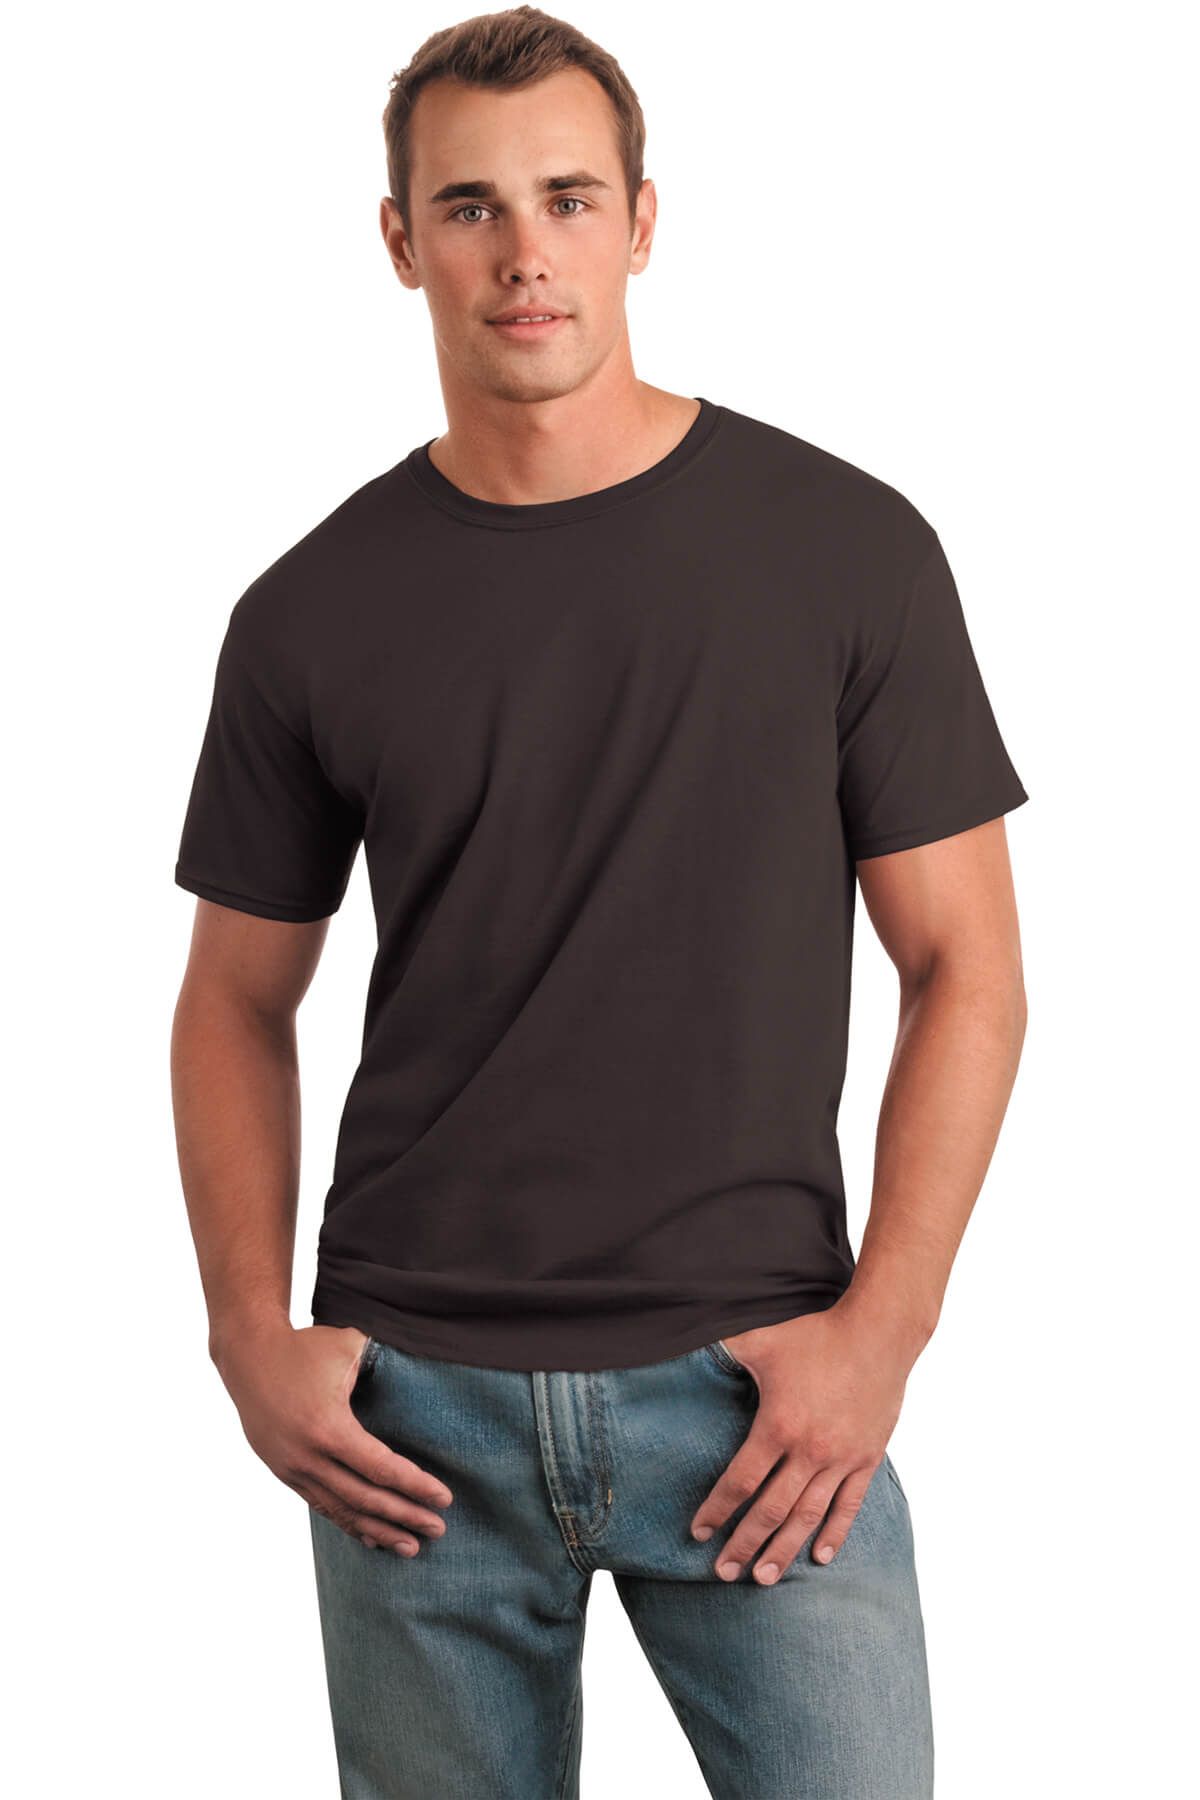 Dark Chocolate T-Shirt Model Front